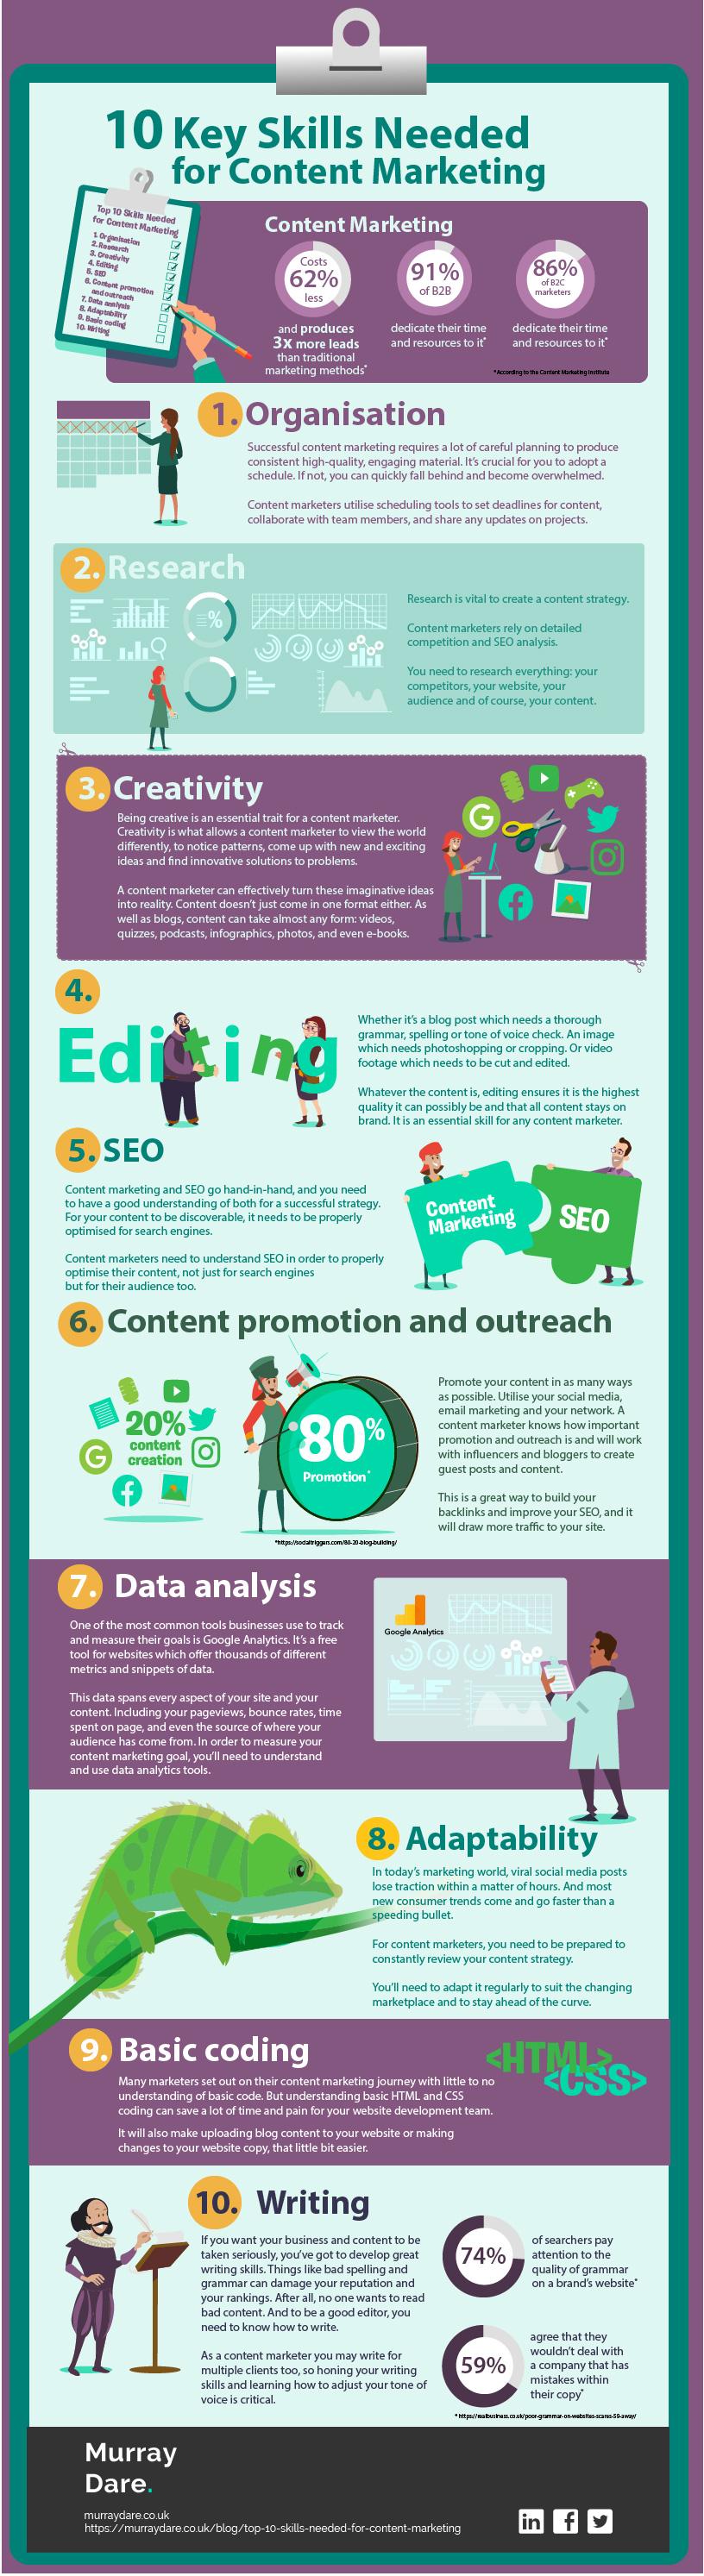 content marketing skills infographic